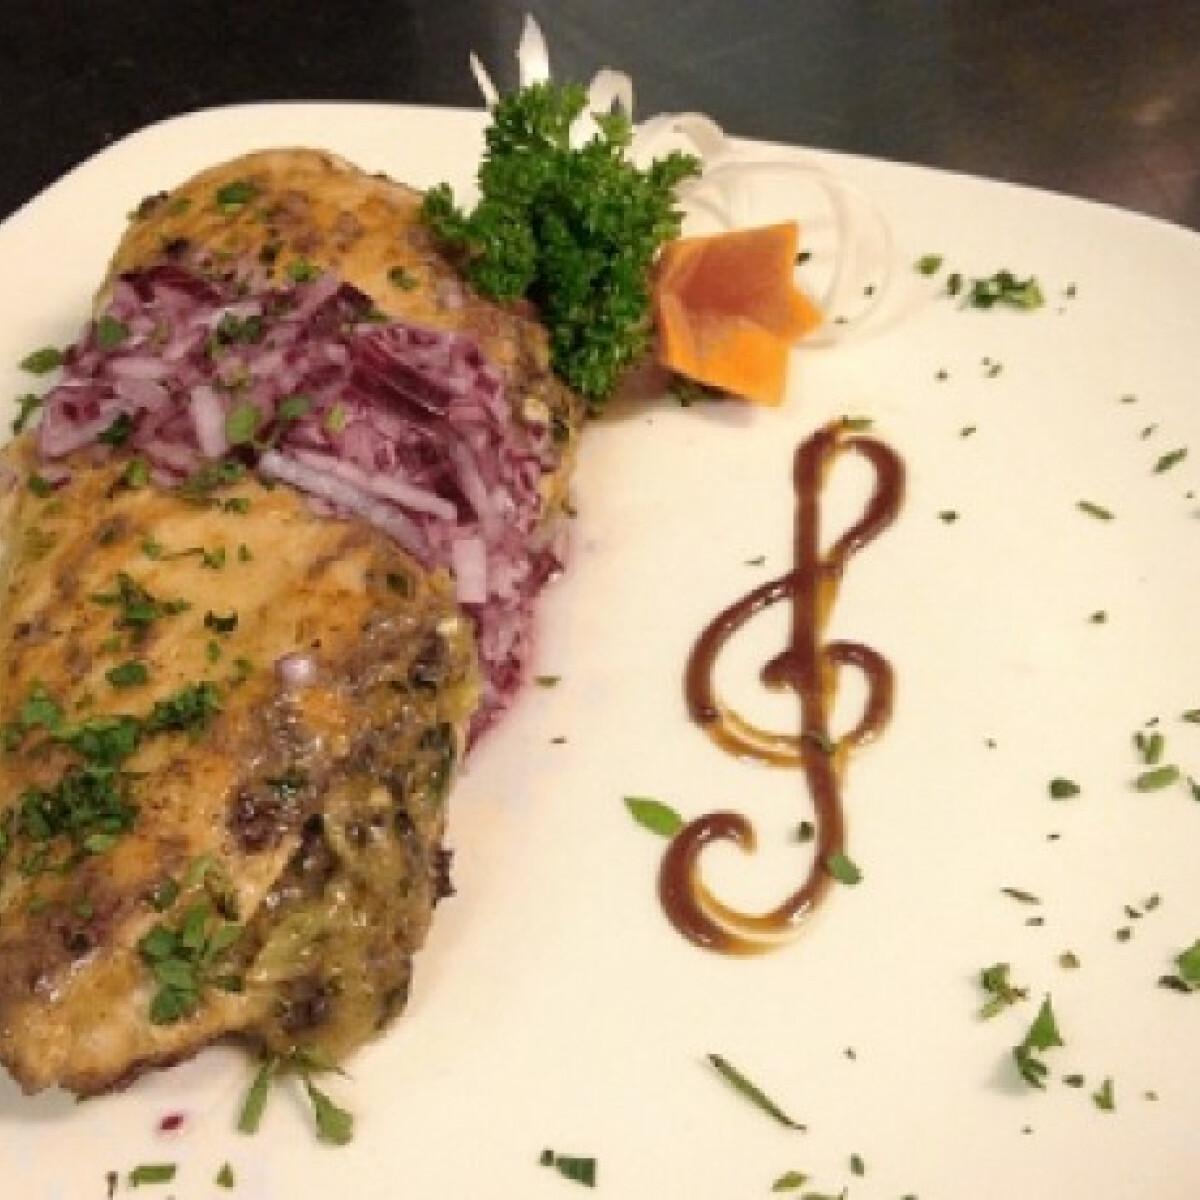 Rózsaborsos csirkemell lilahagyma salátával